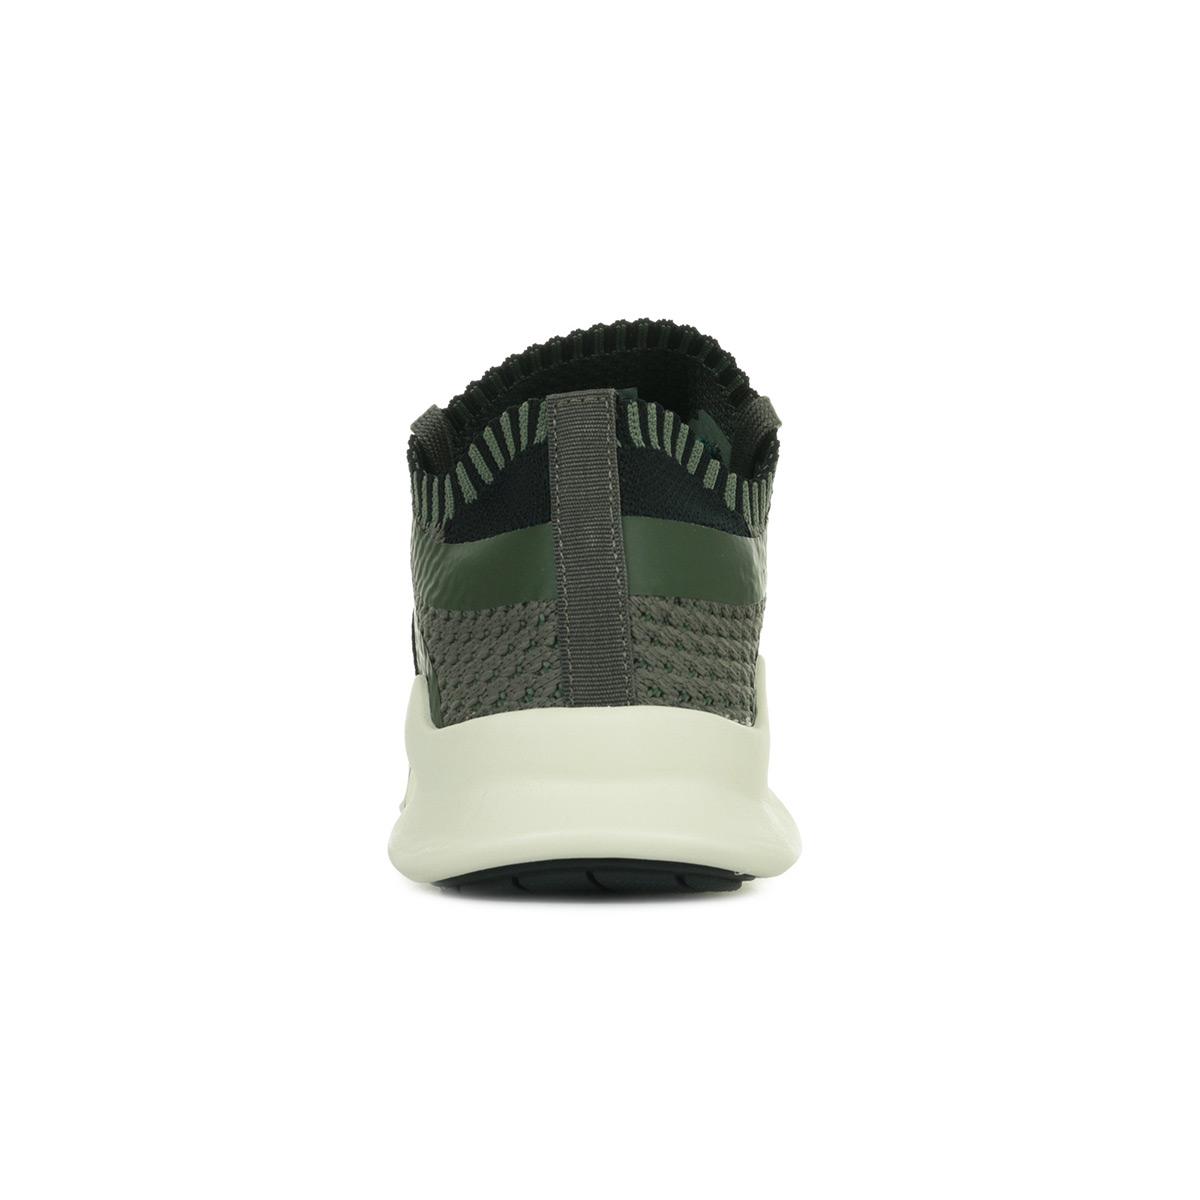 brand new 77403 c2cb1 ... adidas EQT Support Adv Pk ...